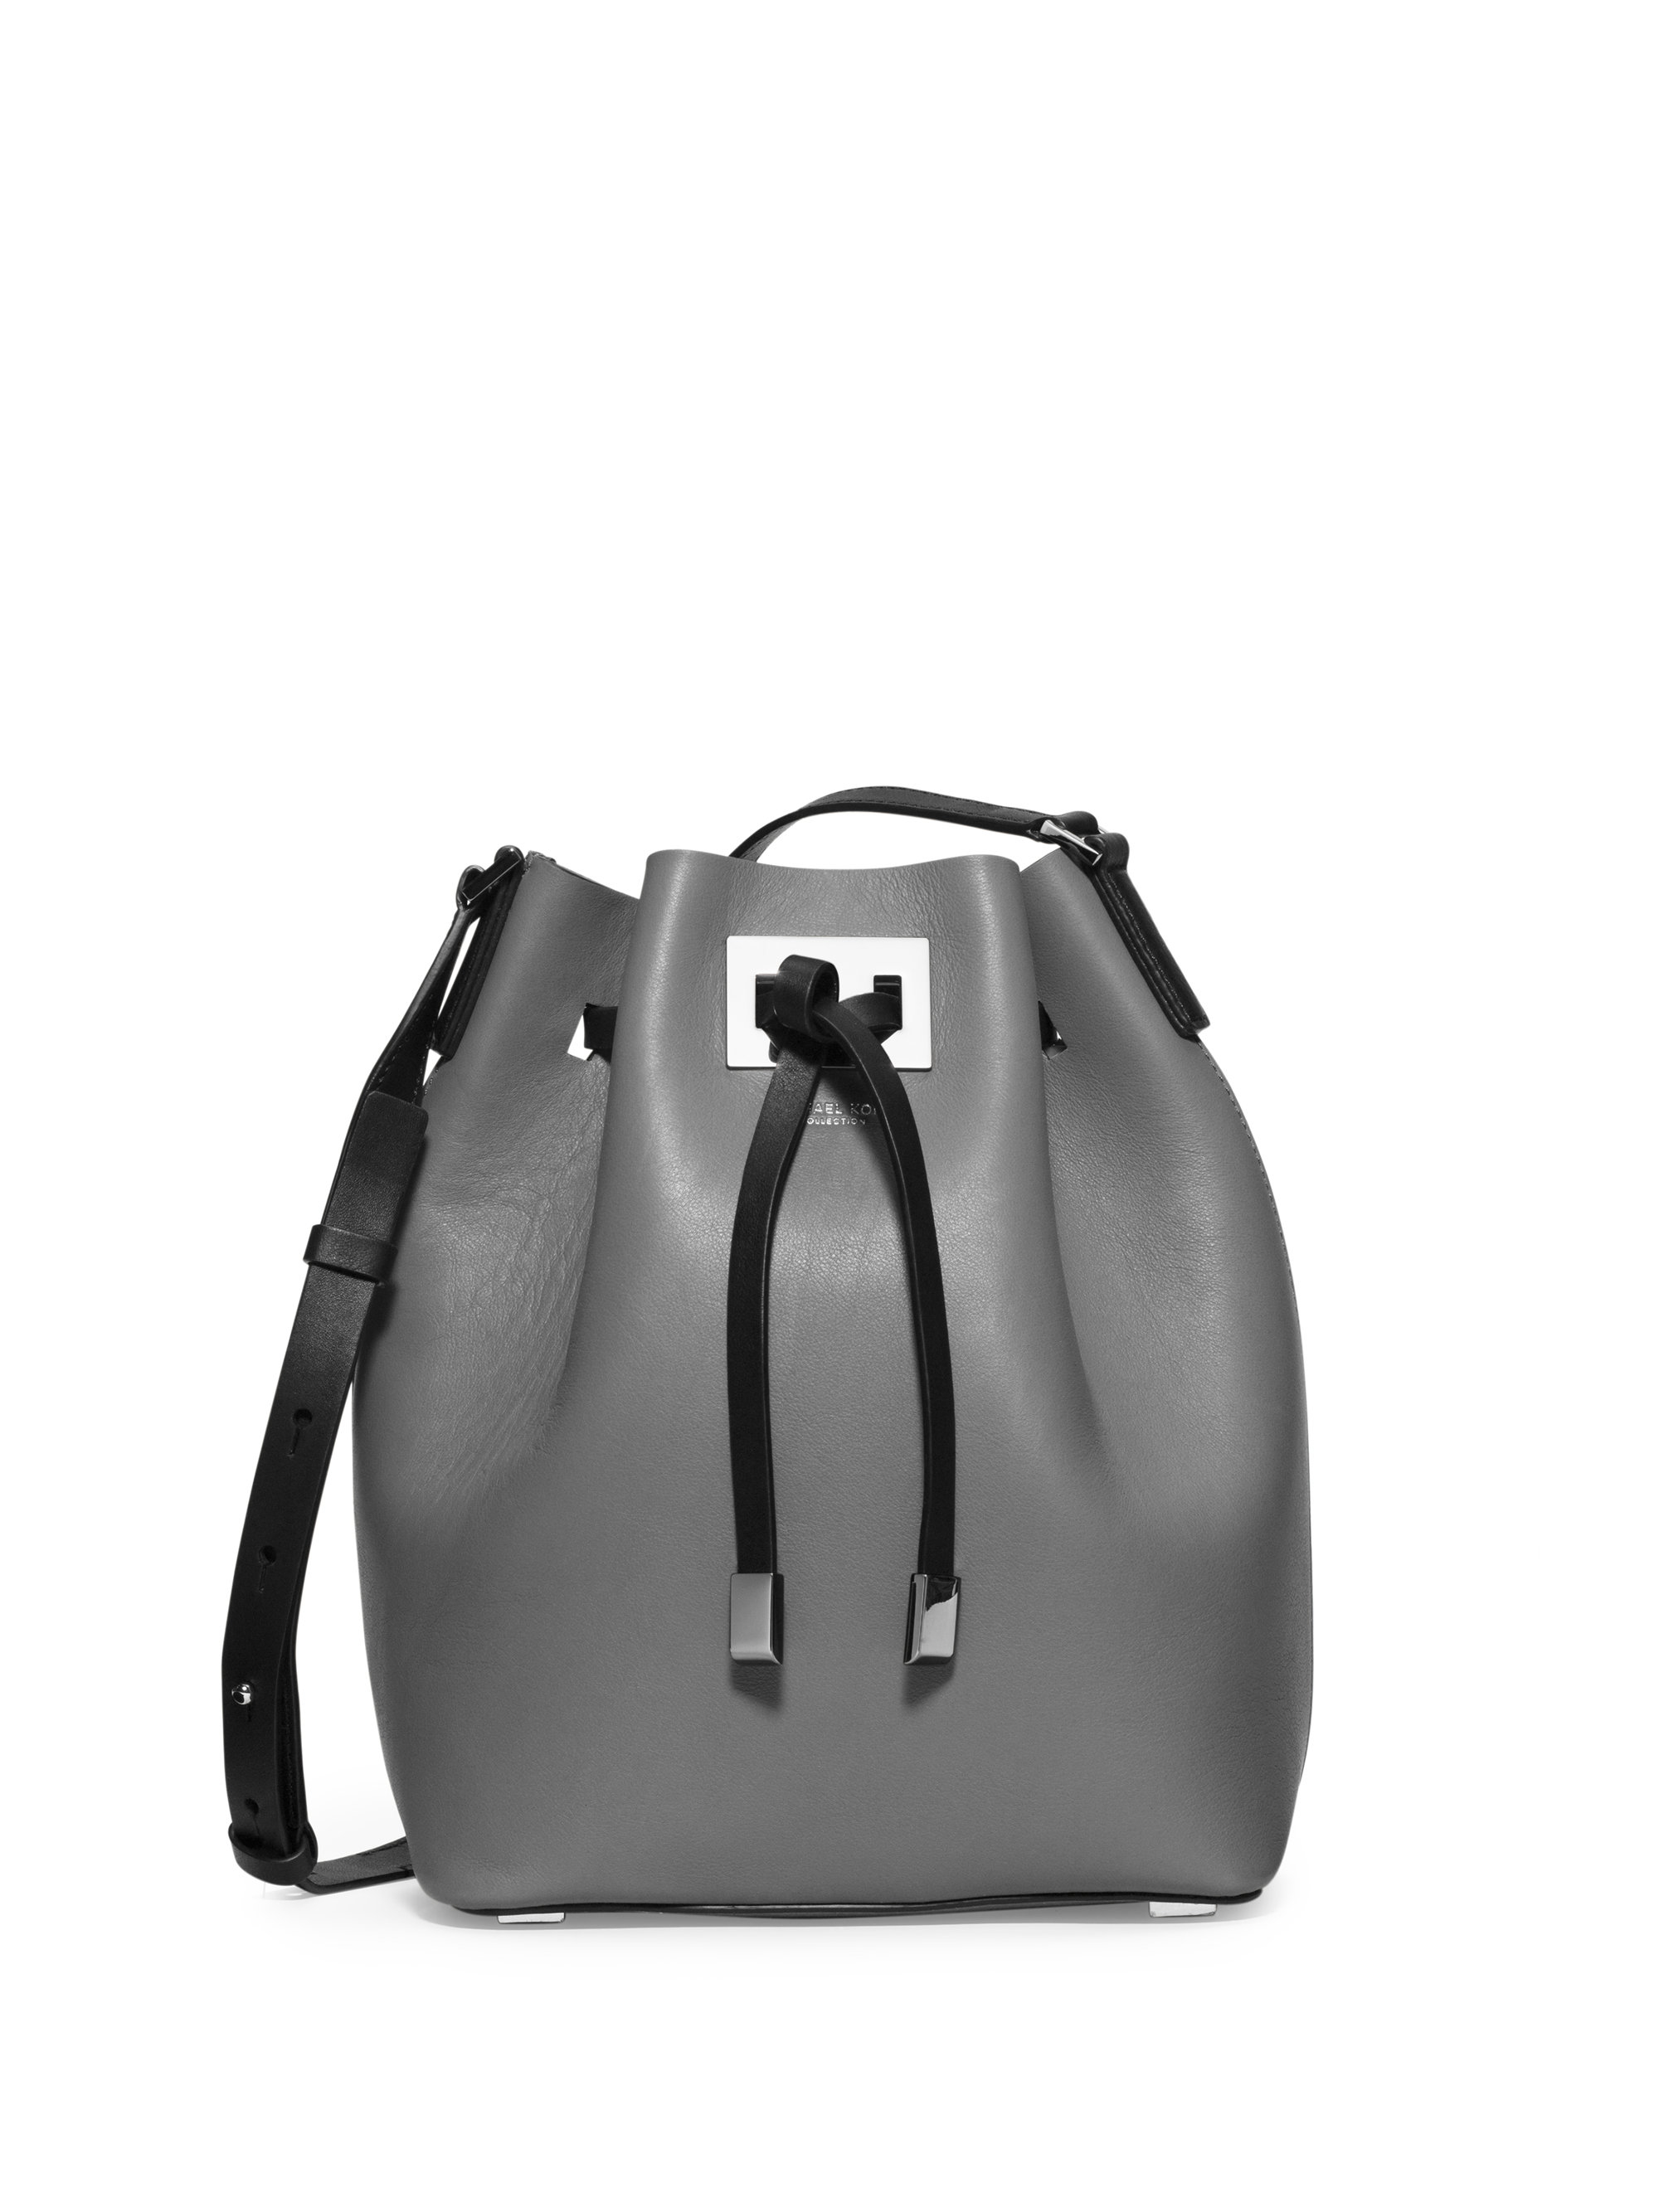 Michael Kors Miranda Medium Colorblock Leather Bucket Bag